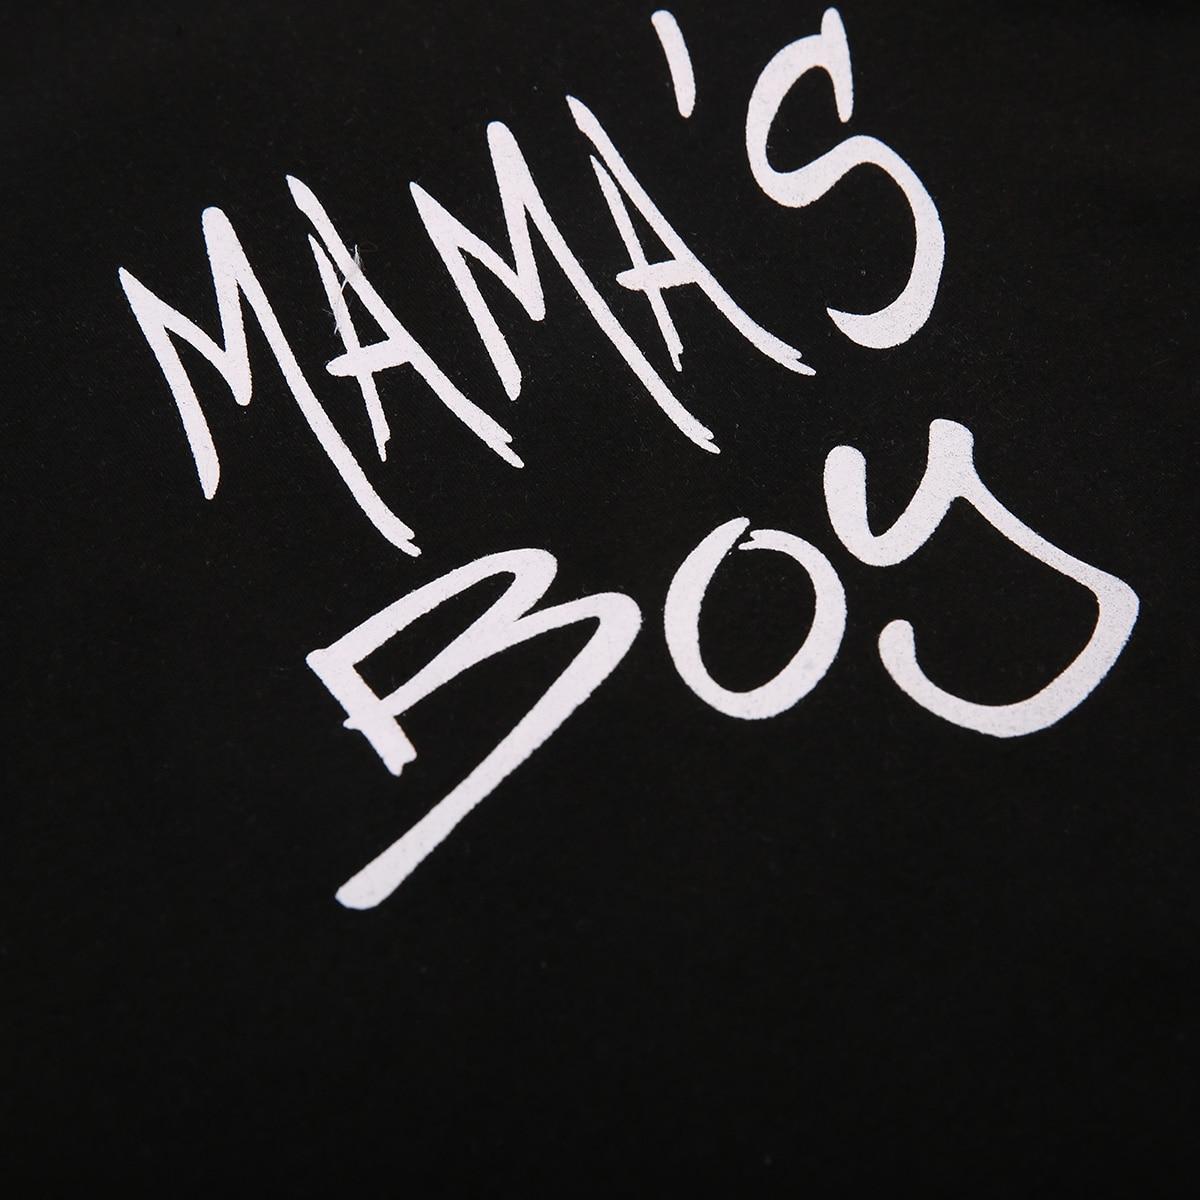 2017-Summer-Kids-Clothes-Mamas-Boy-Short-Sleeve-Cotton-T-shirt-TopsJean-Shorts-Denim-Pant-2PCS-Baby-Boys-Clothing-Set-1-6Y-3